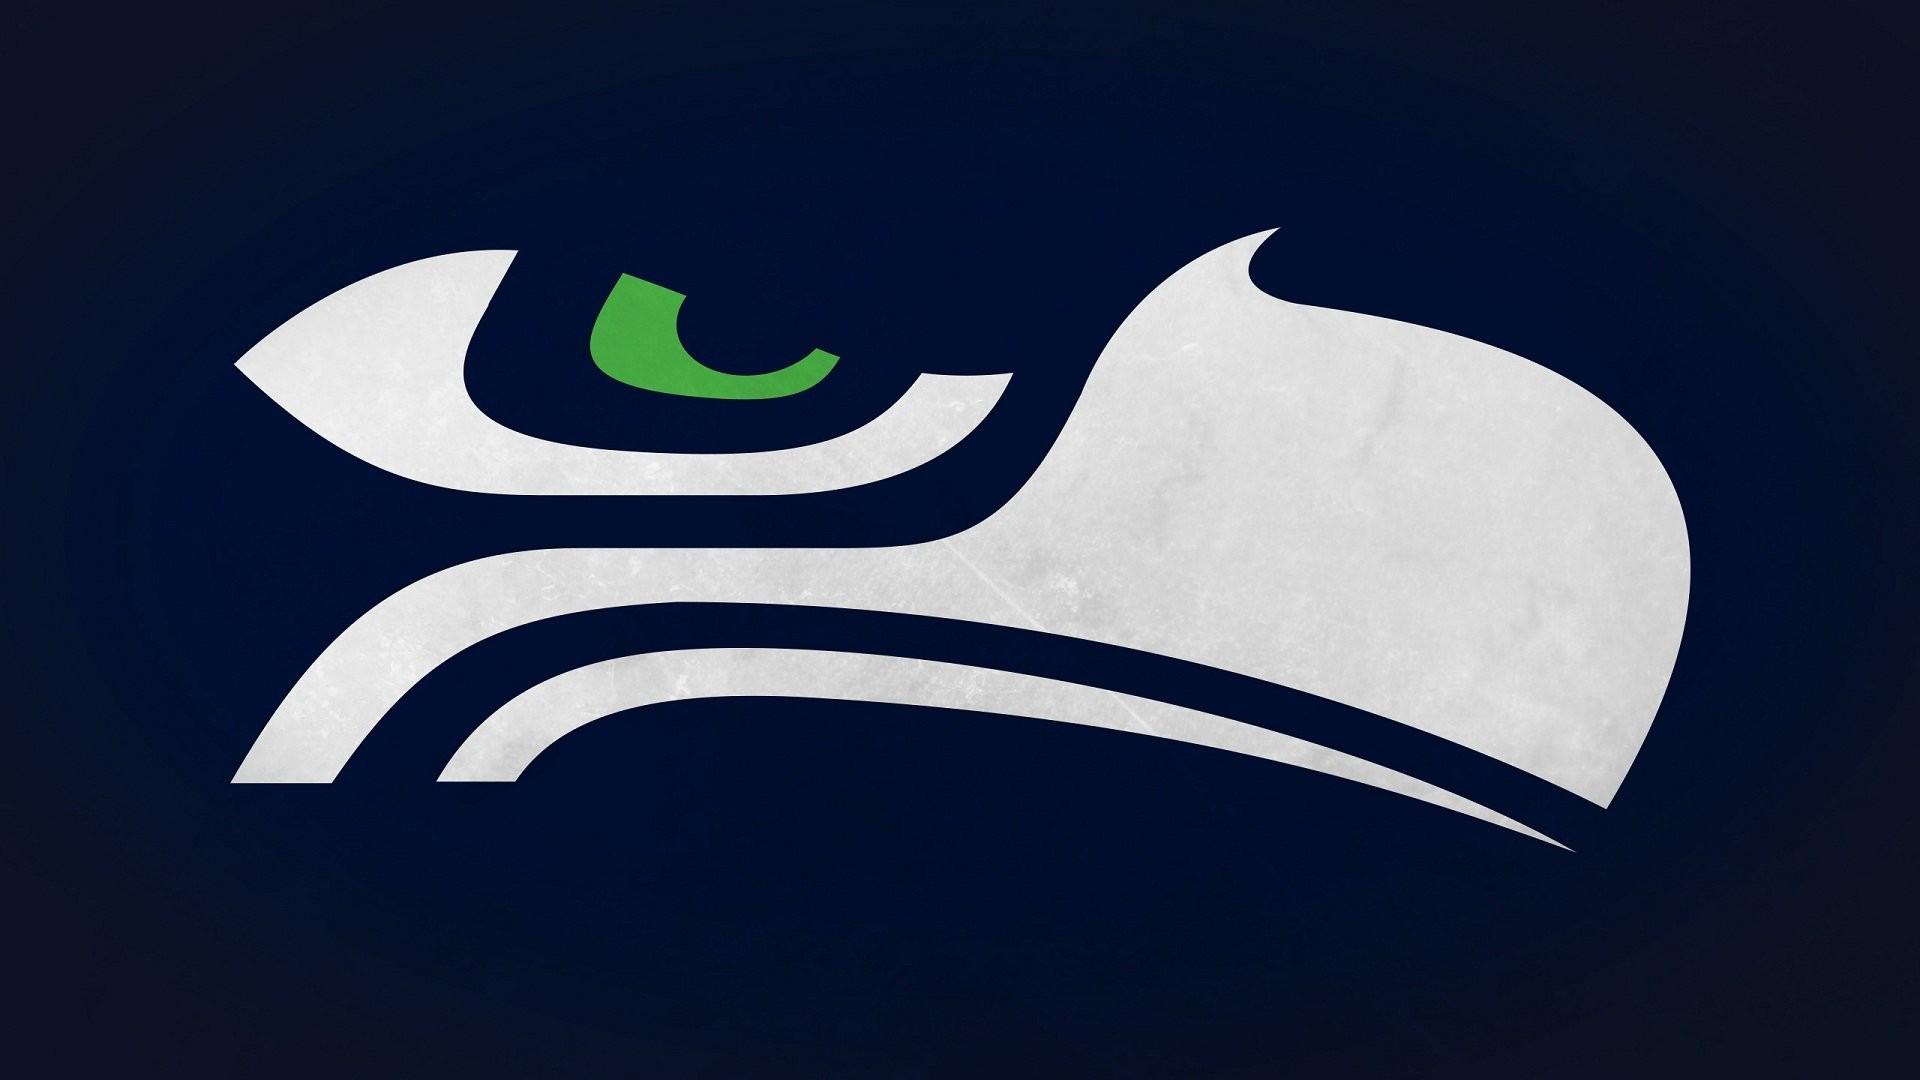 SEATTLE SEAHAWKS nfl football wallpaper background